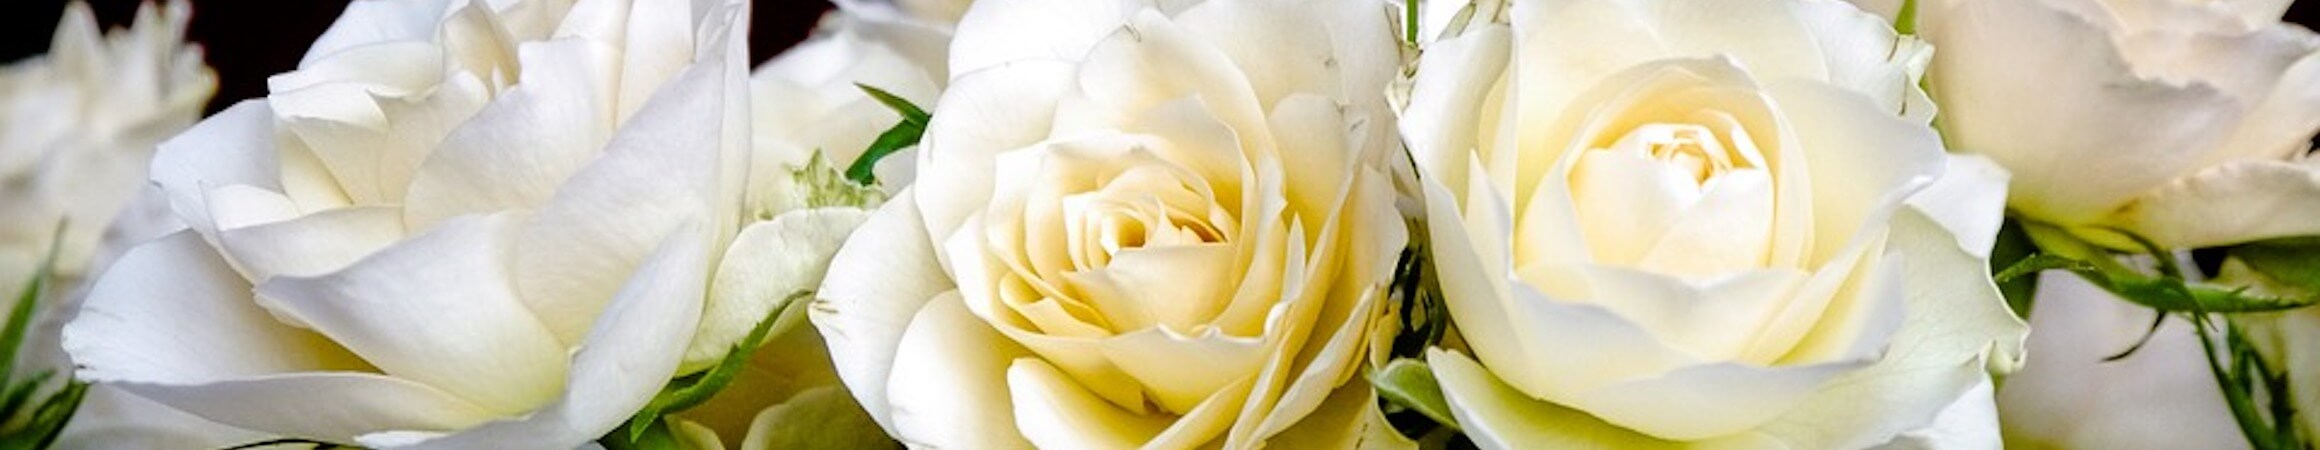 Roses 2198156 960 720